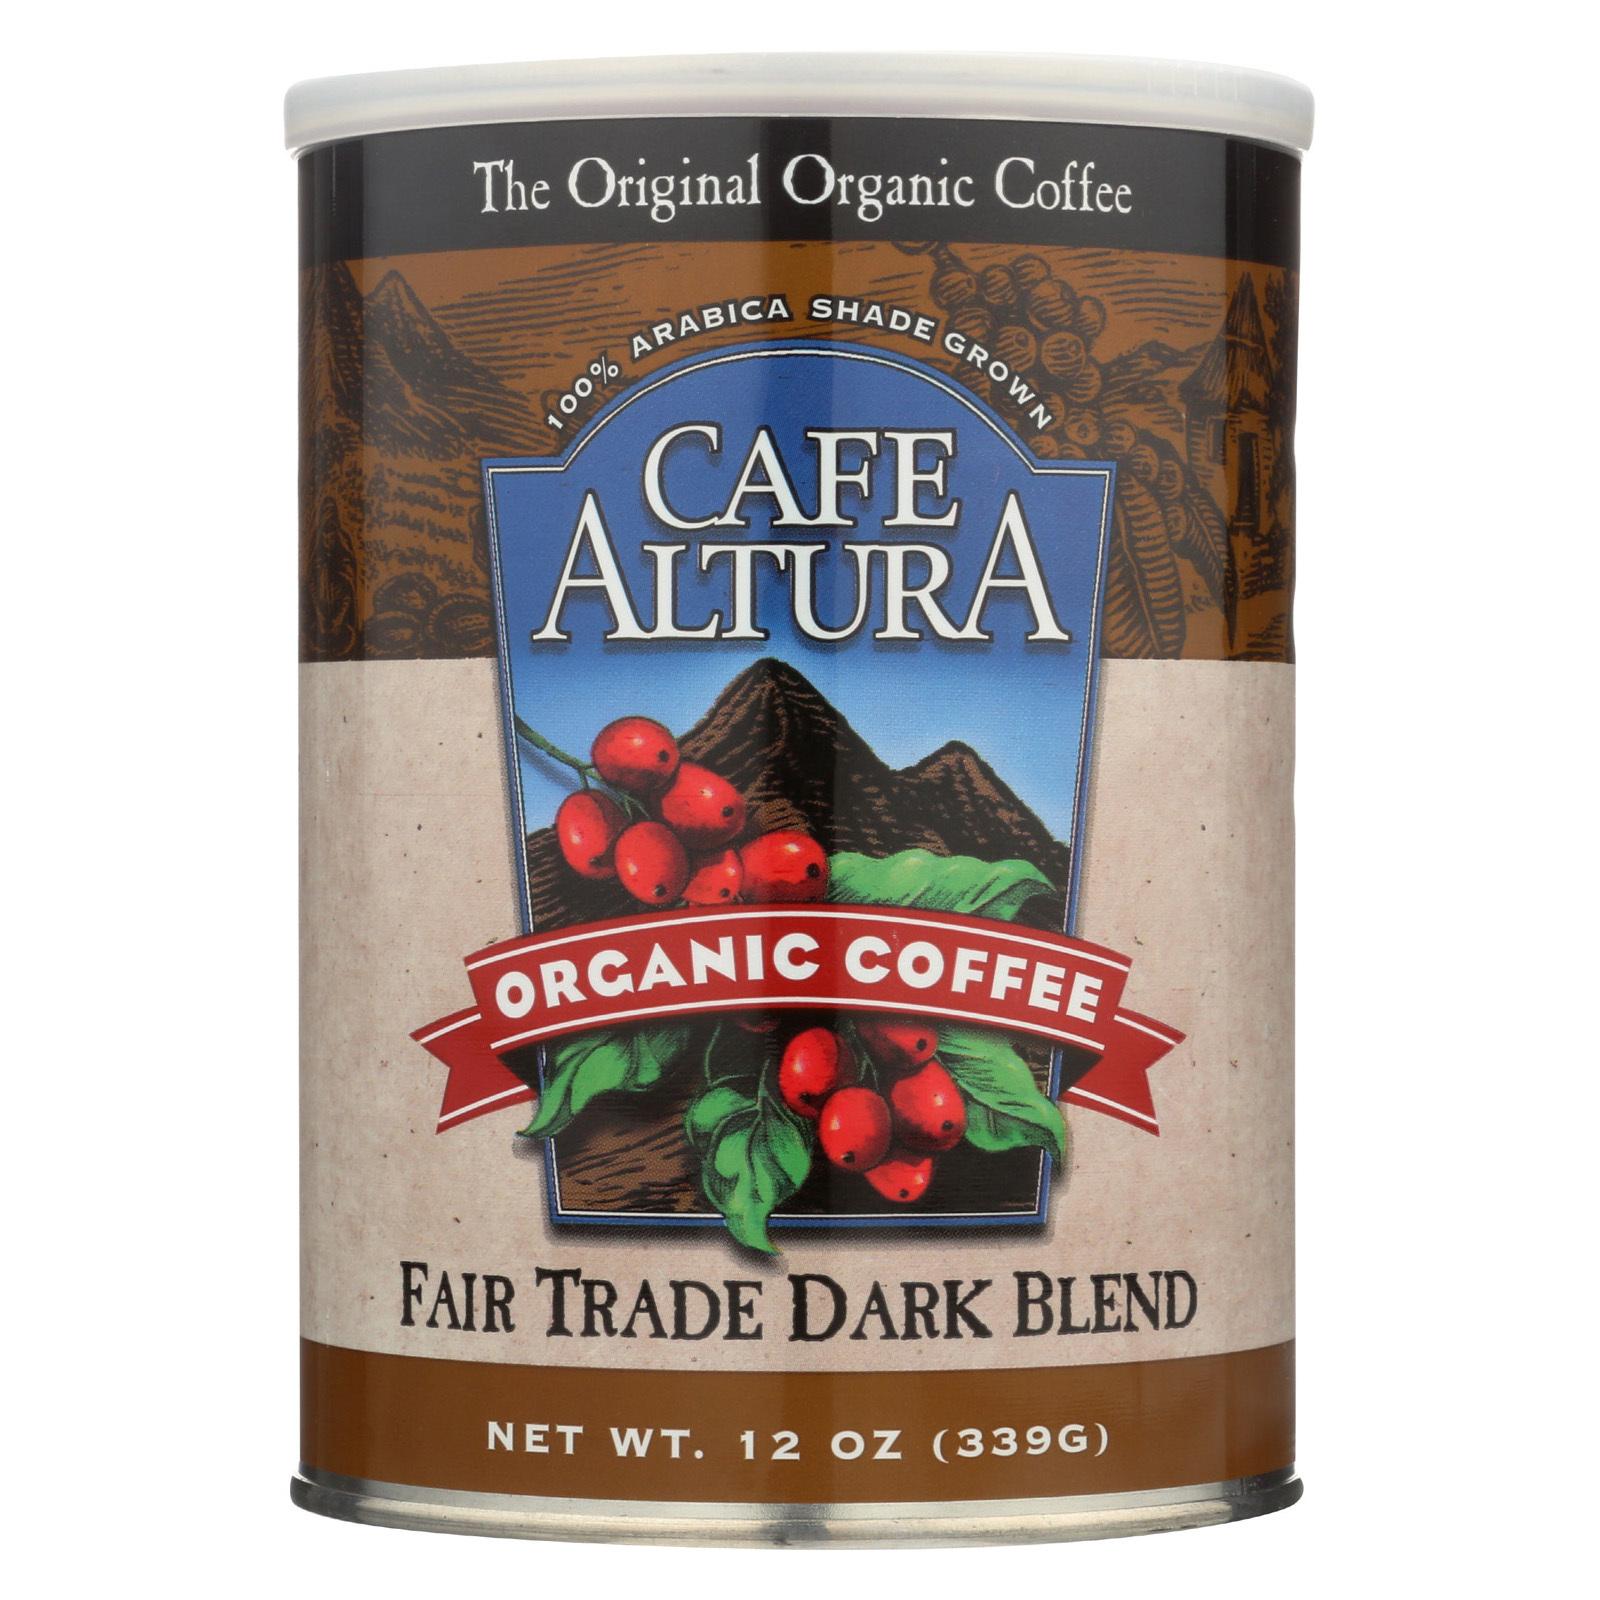 Cafe Altura 100% Organic Fair Trade Dark Blend Coffee - Case of 6 - 12 oz